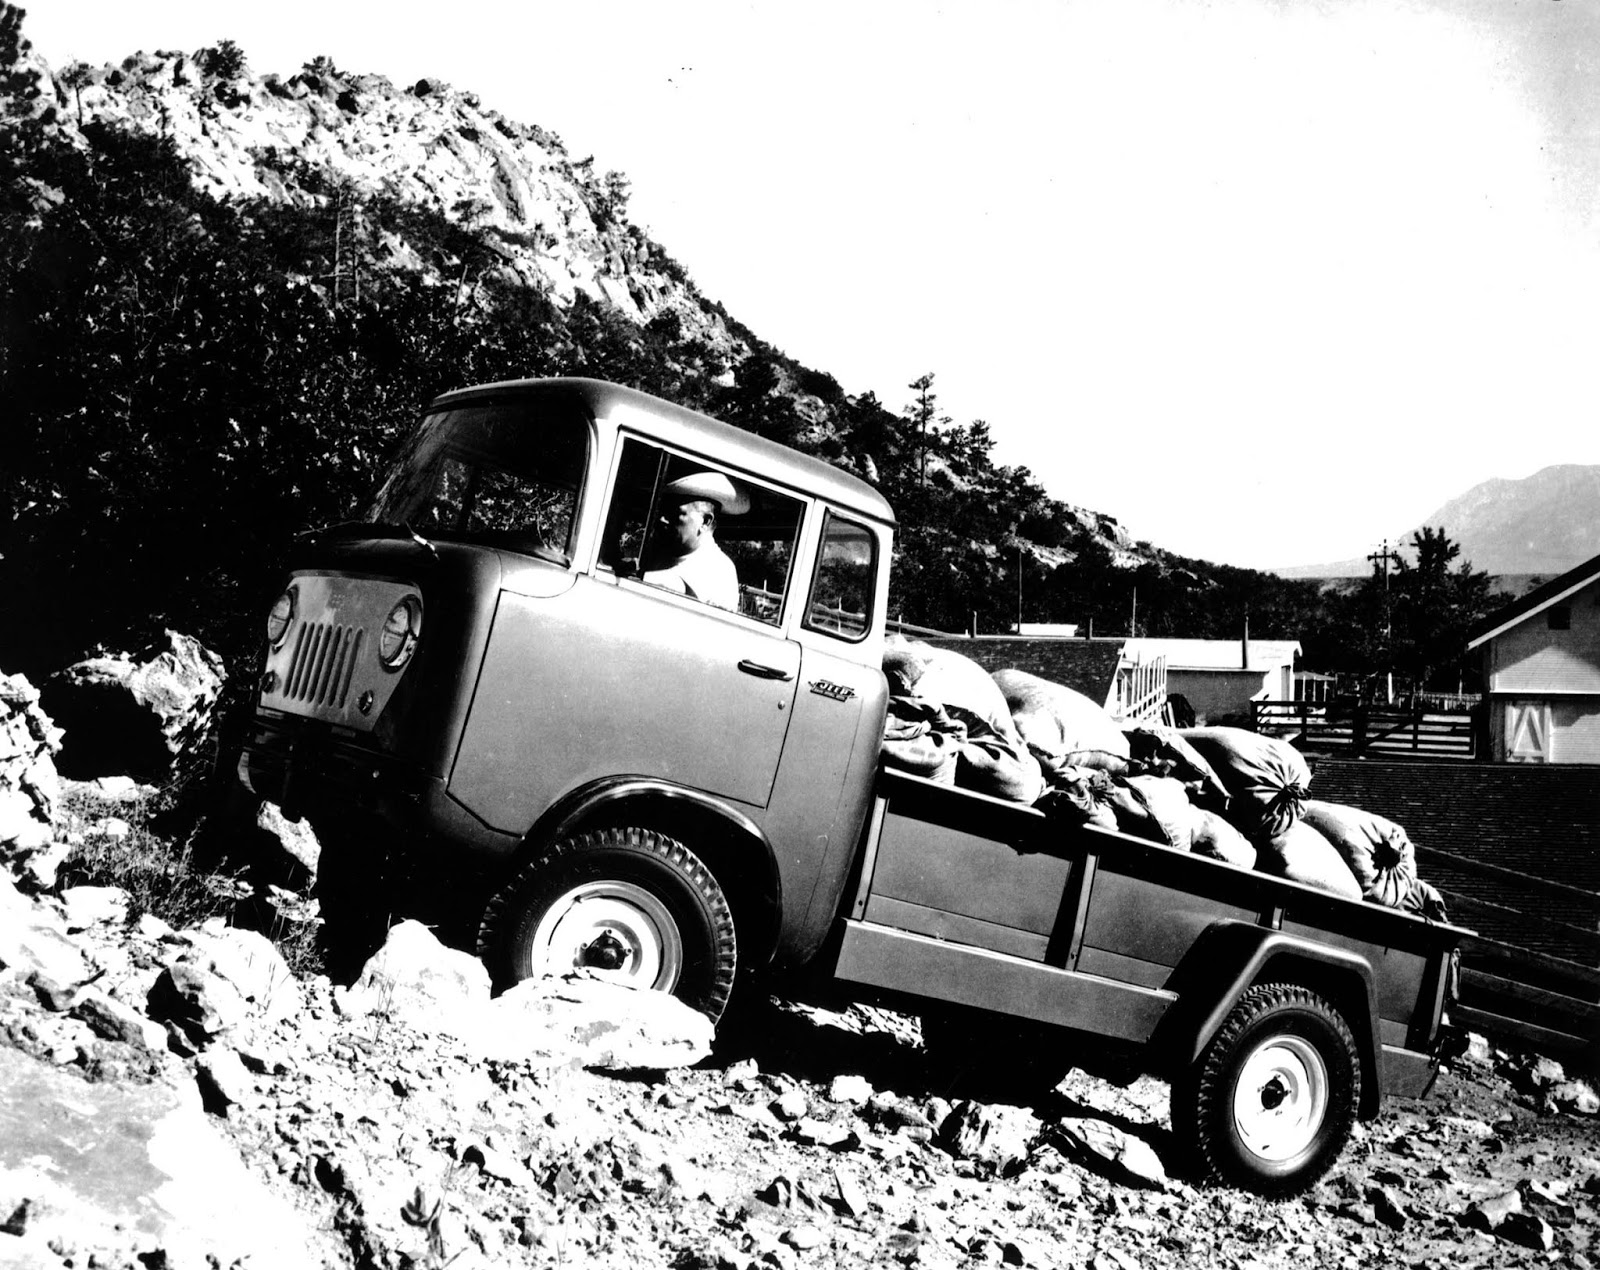 1957 Jeep FC 170 To Jeep Gladiator, έρχεται να αλλάξει τα δεδομένα στην κατηγορία των pick-up Gladiator, Jeep, Jeep Gladiator, zblog, ειδήσεις